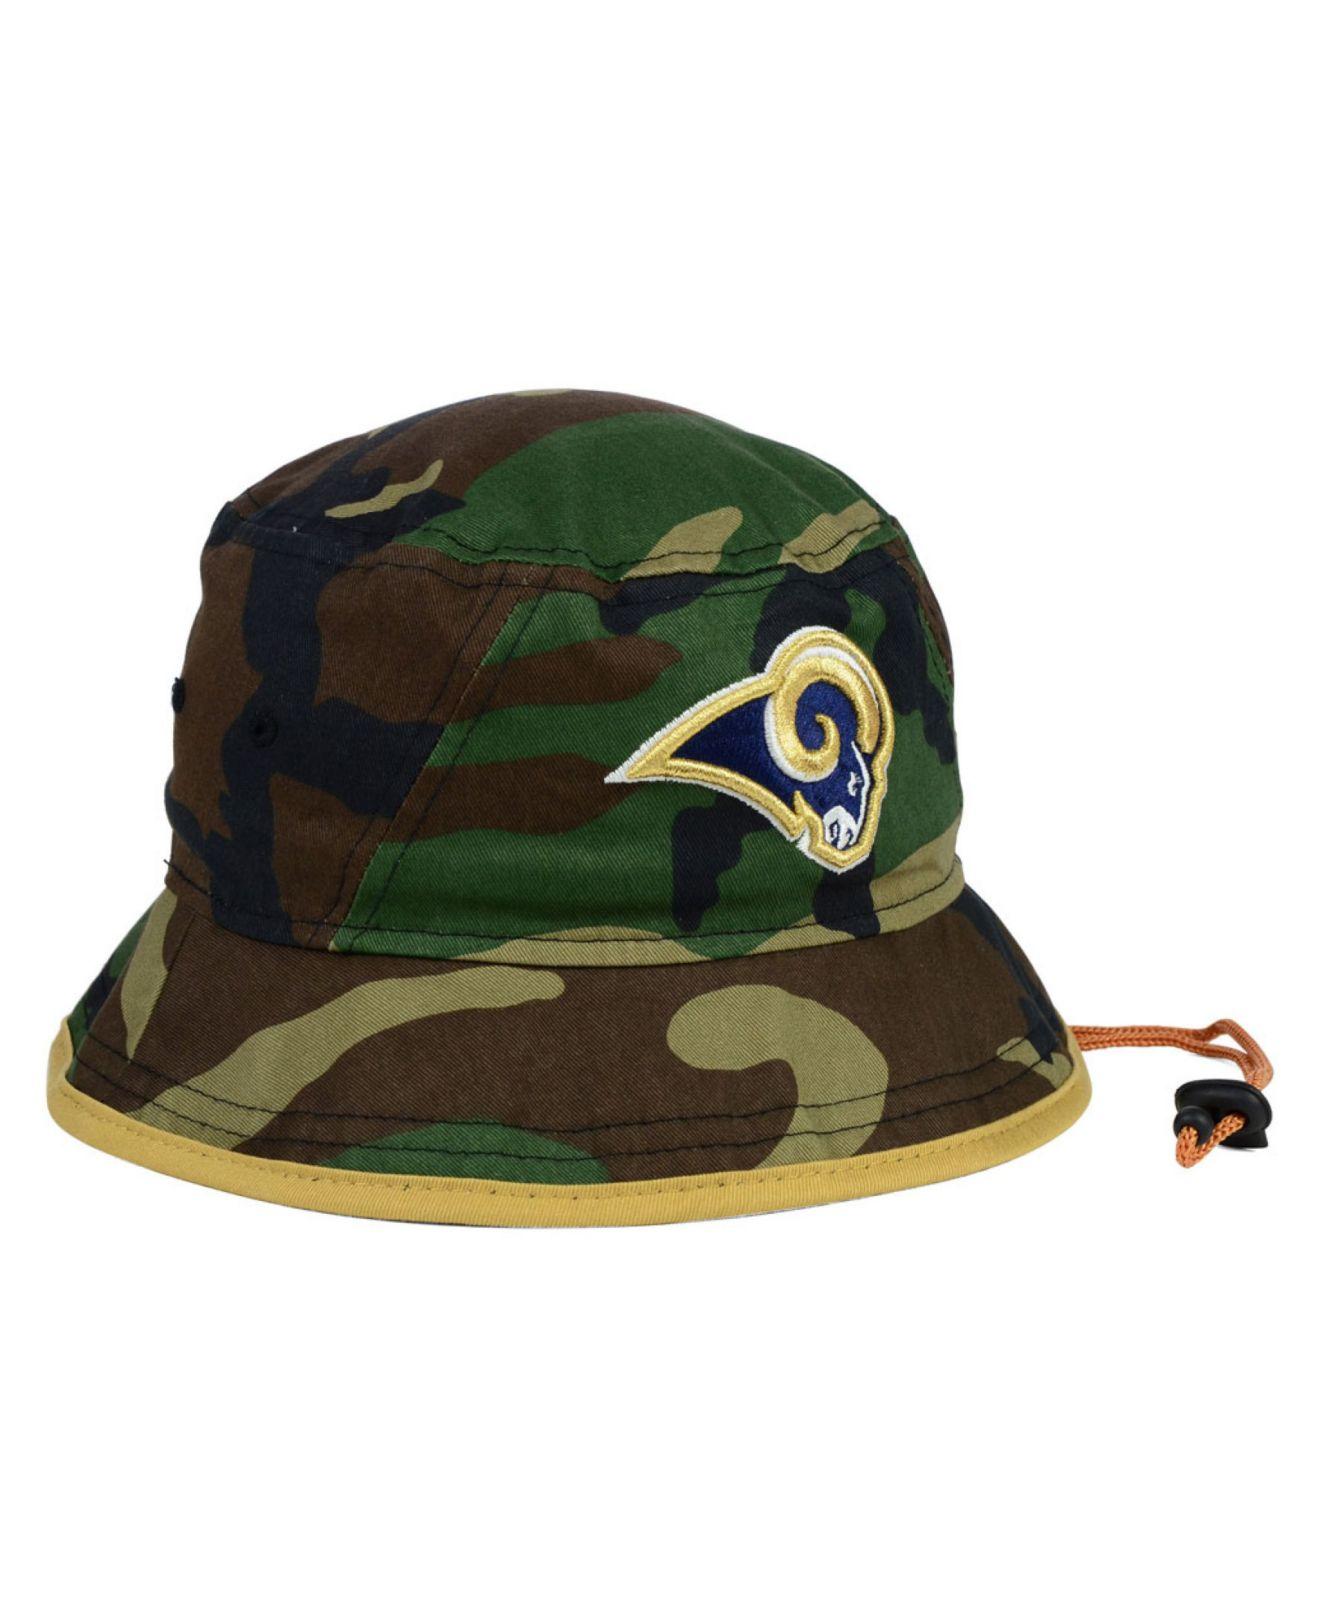 d81388ff823d2 Lyst - KTZ St. Louis Rams Camo Pop Bucket Hat in Green for Men